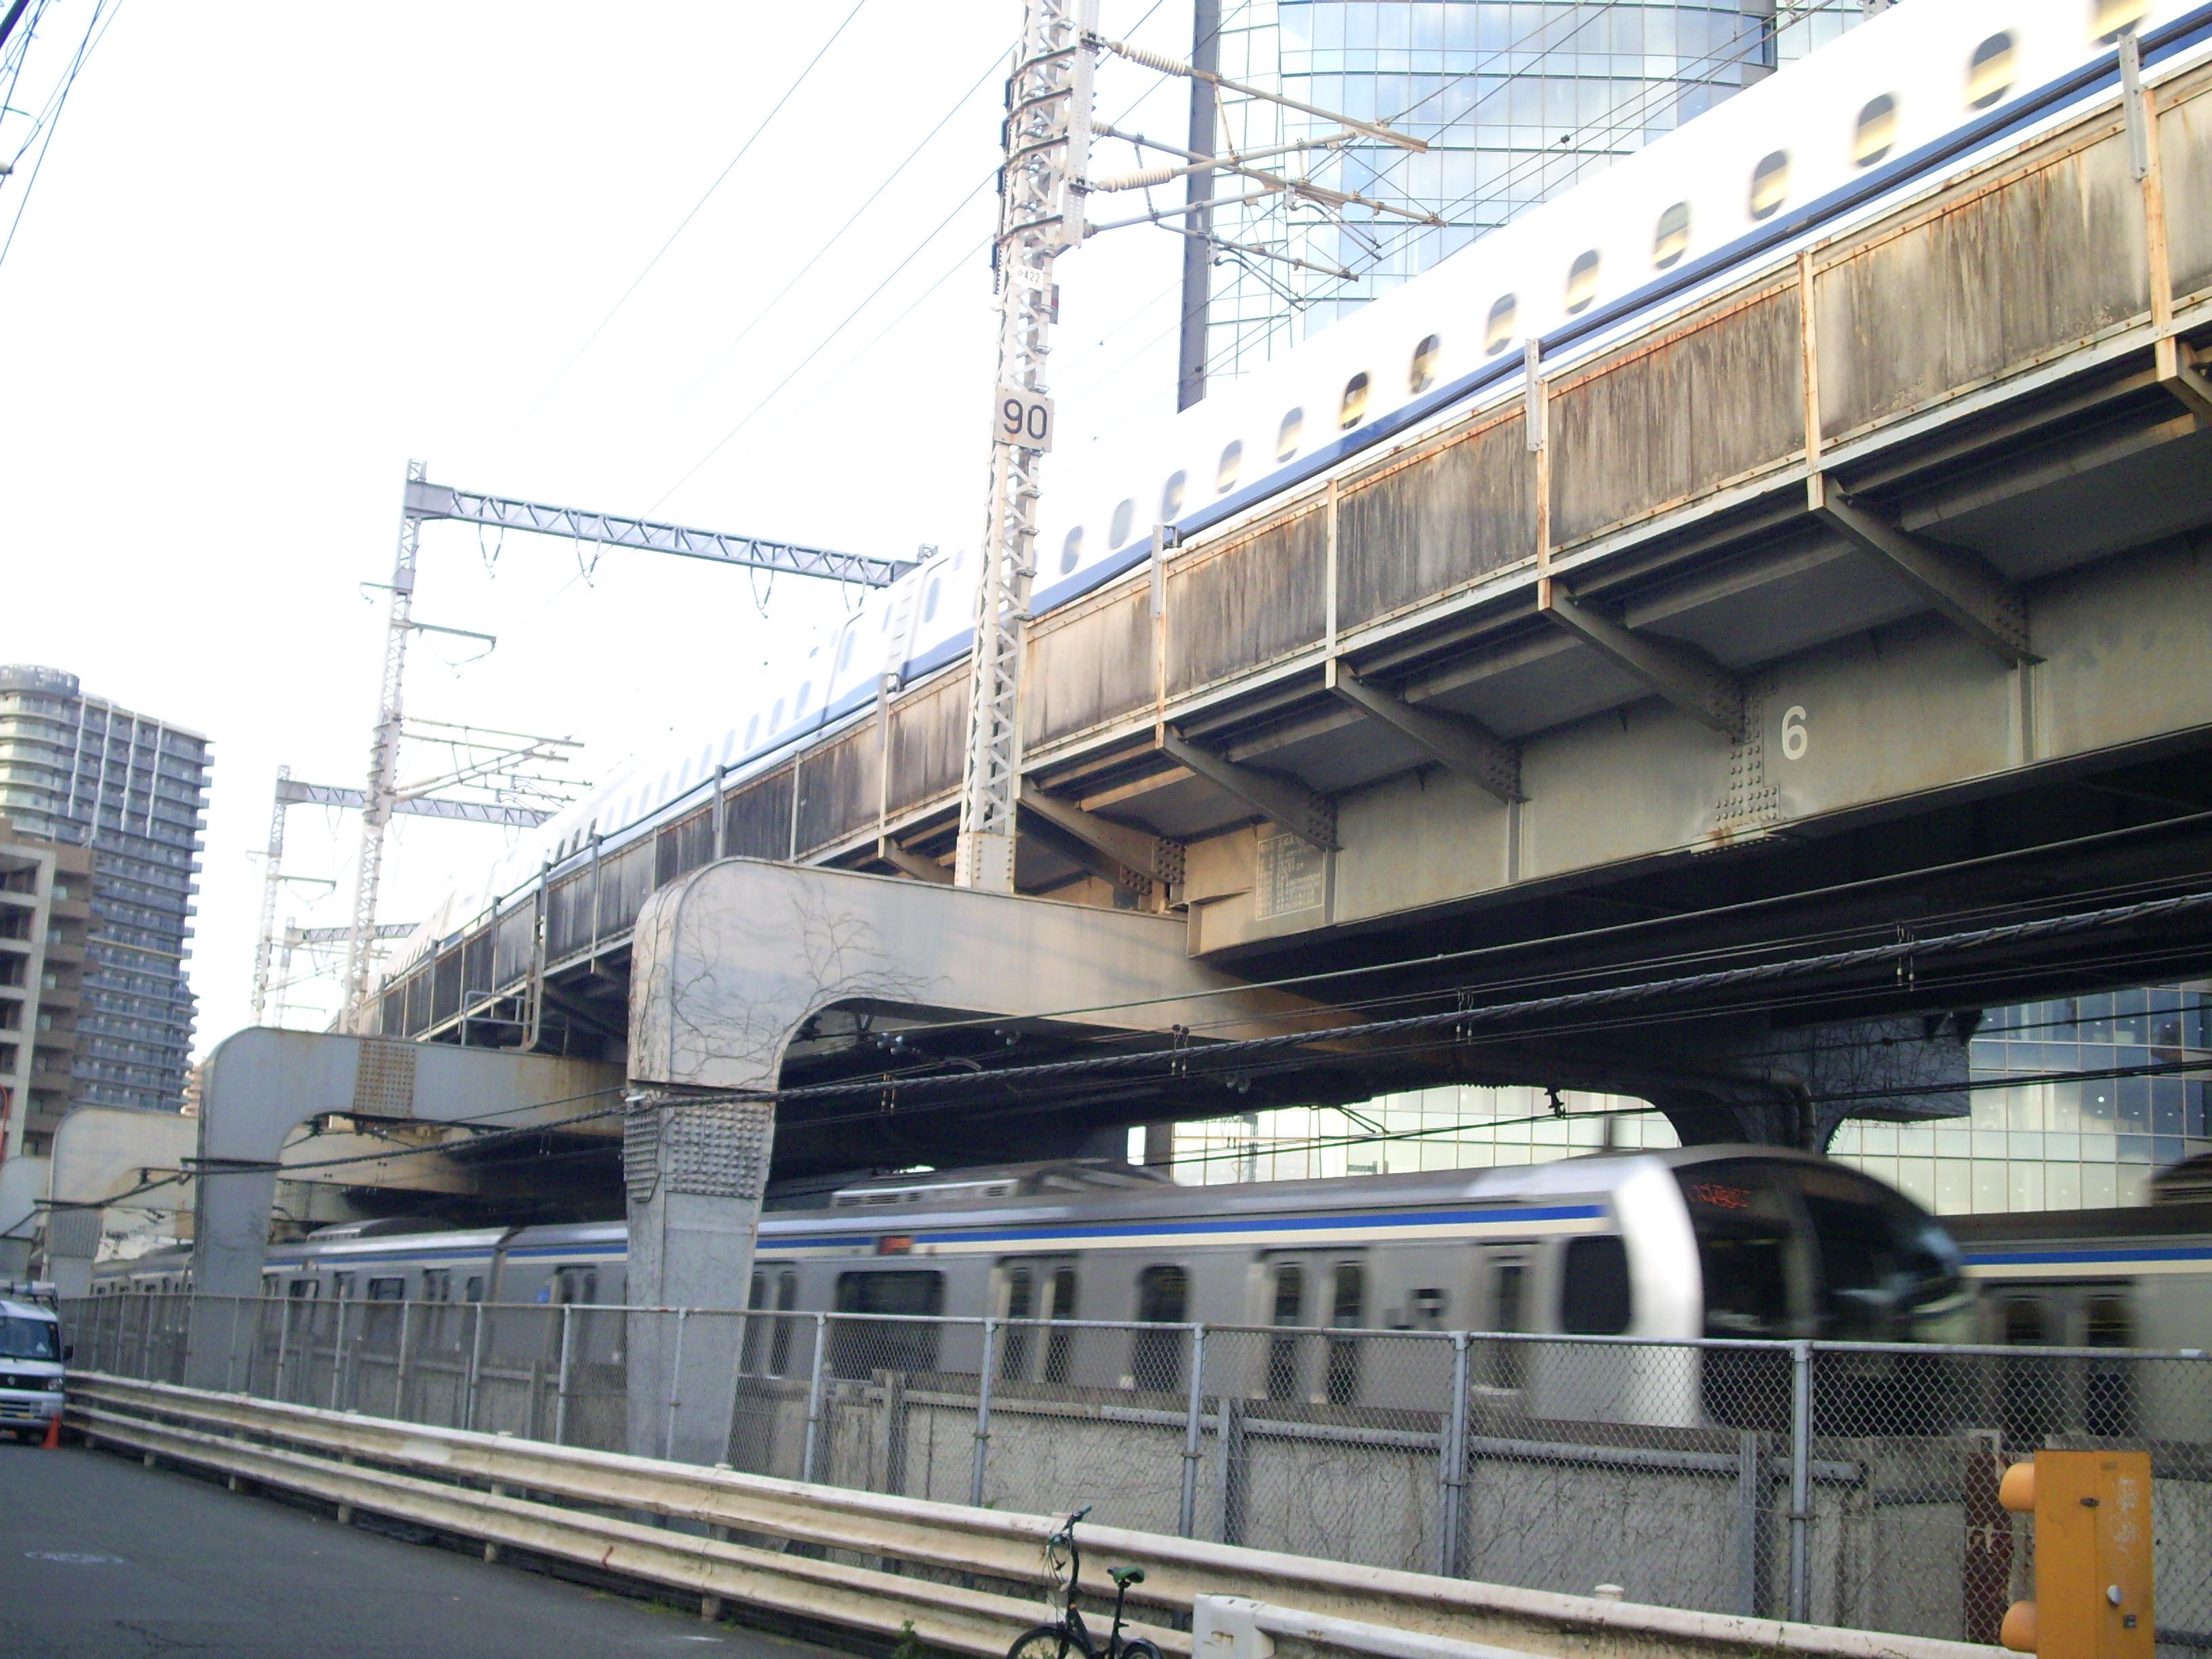 https://upload.wikimedia.org/wikipedia/commons/e/e1/Above_Bl_-_Hinkaku_line_%26_Tokaido_Shinkansen_3.jpg